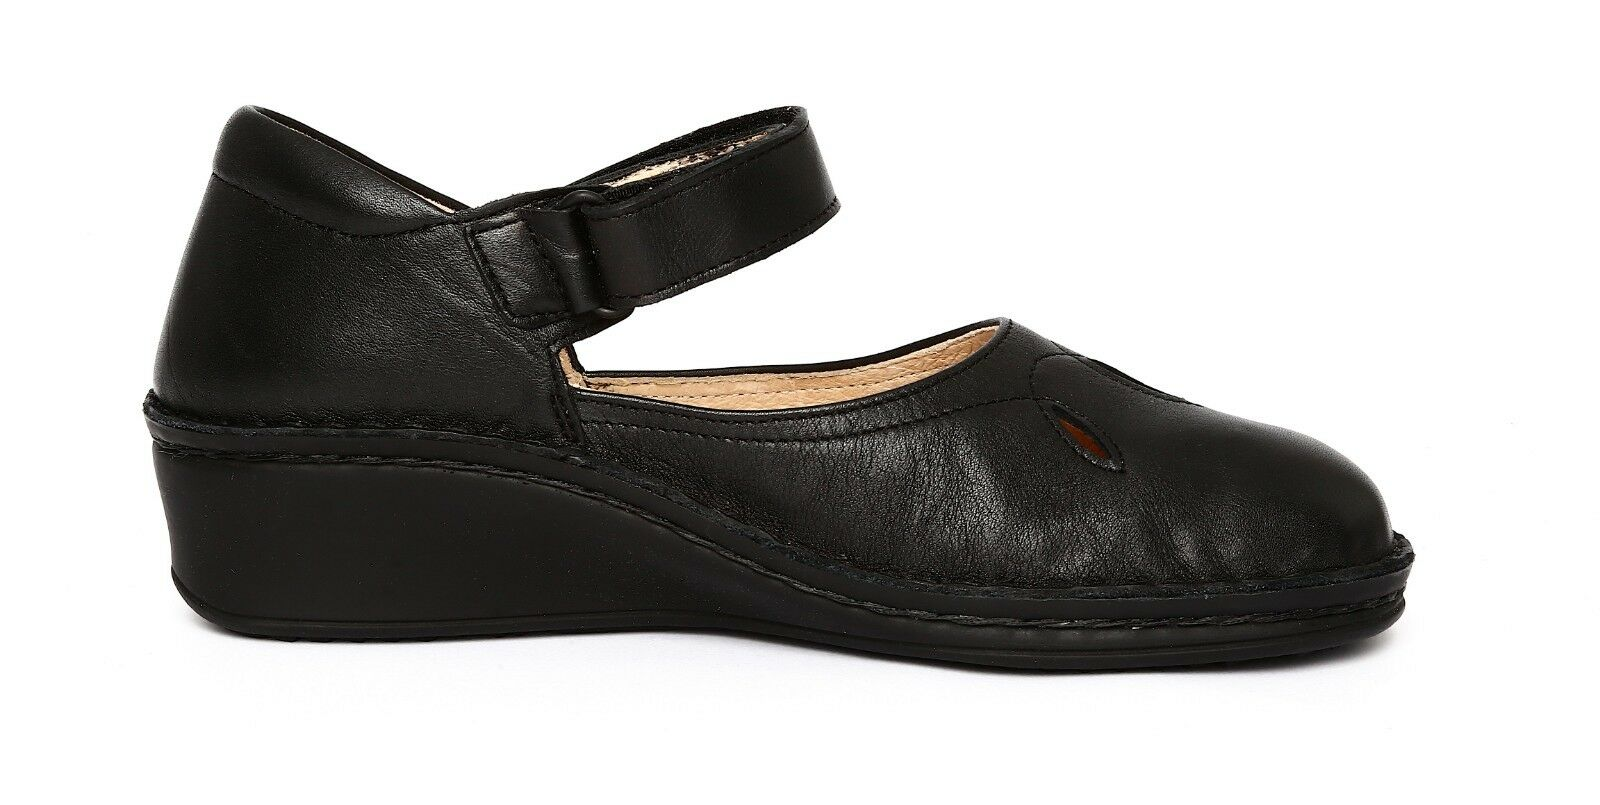 Finn Comfort Canberra City Women's Black shoes Sz 4UK 4UK 4UK 3132 43cb0d